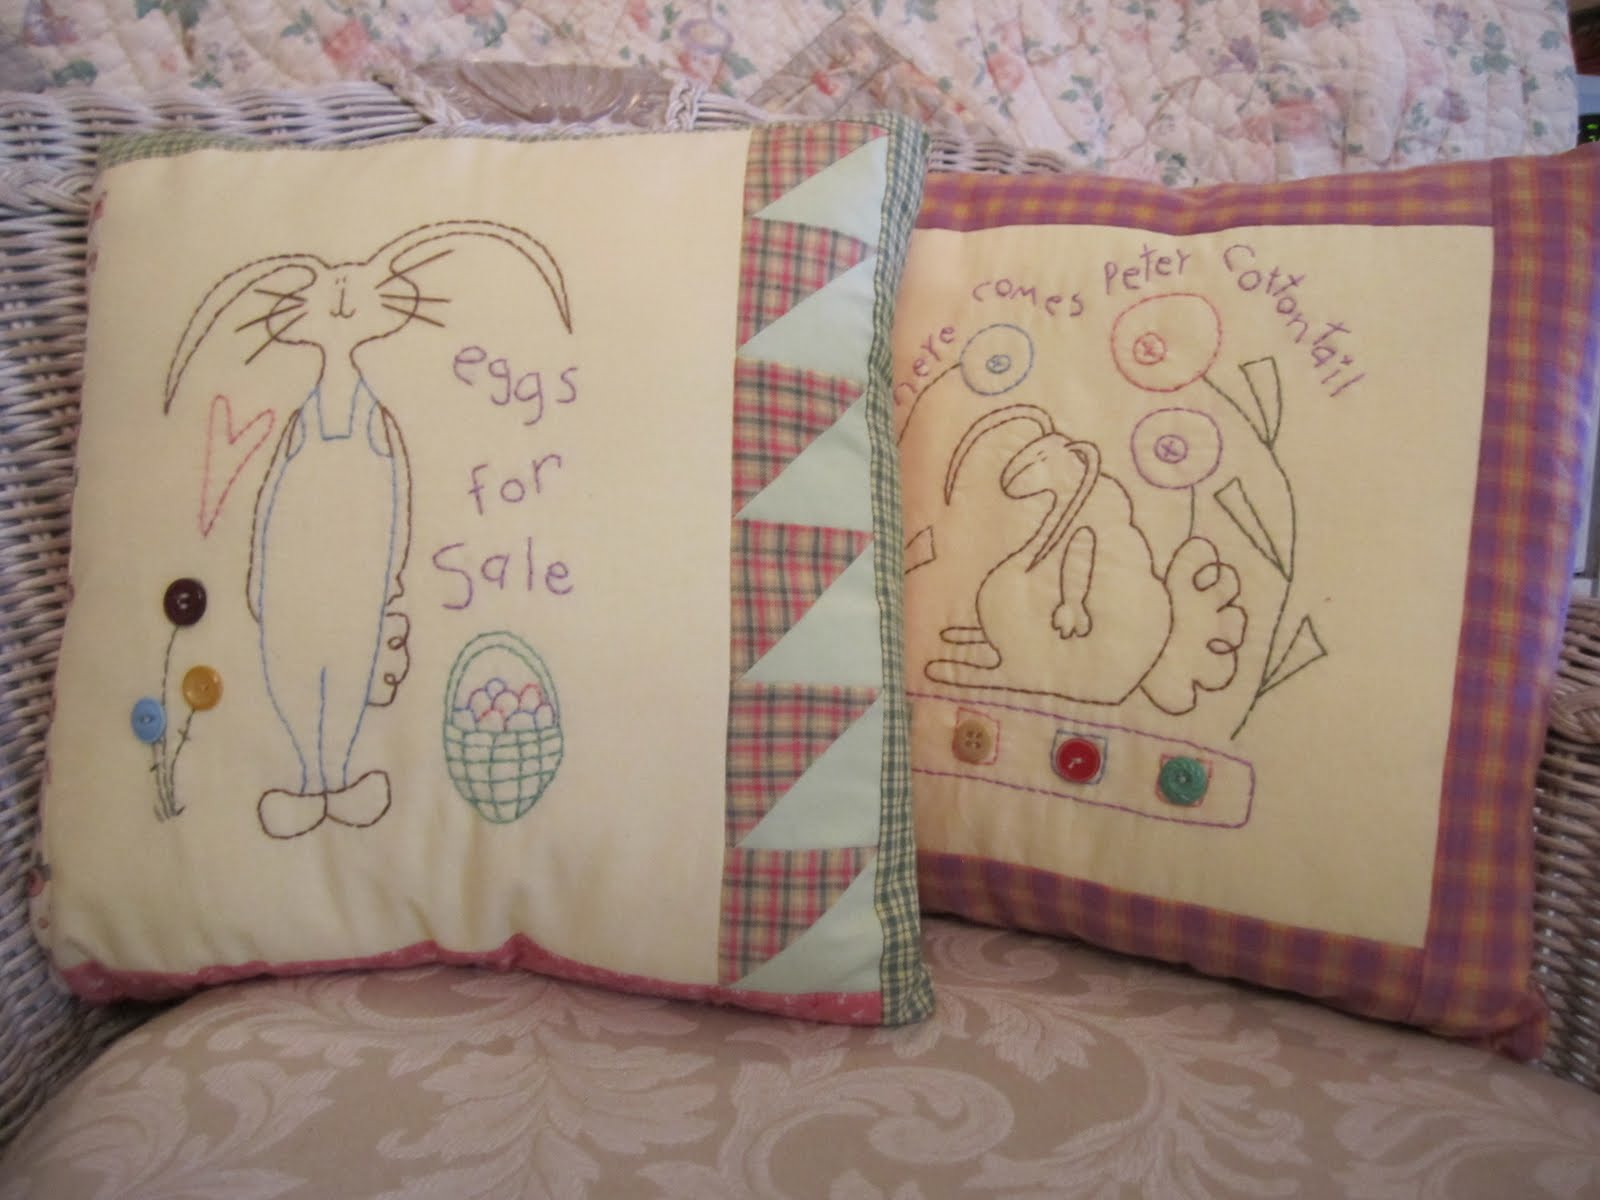 30 Stylish And Adorable Handmade Decorative Easter Pillows ThemesCompany